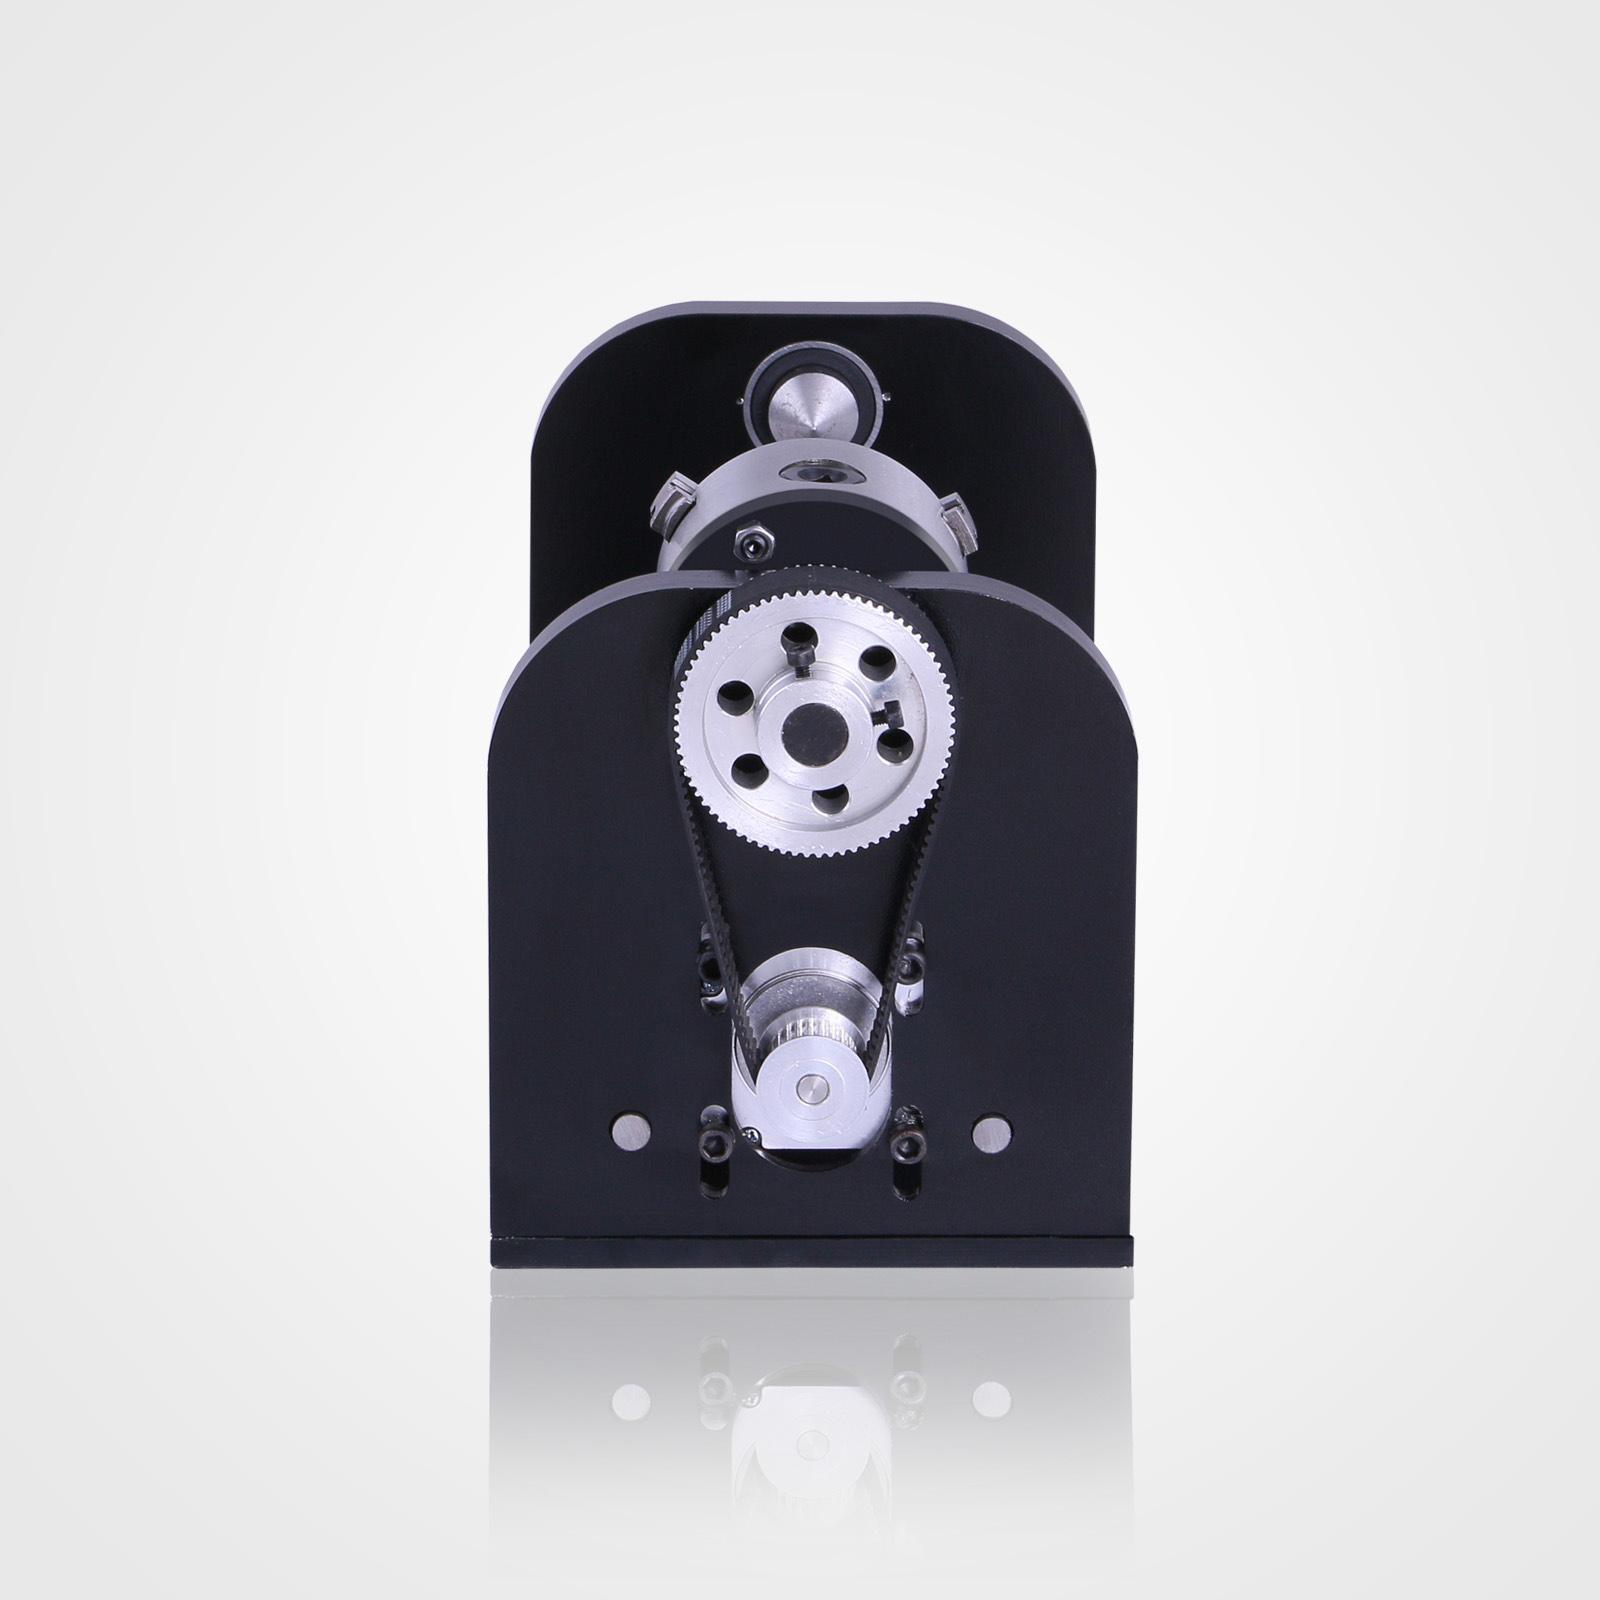 Macchina-per-Incisione-Laser-CO2-40-130W-Asse-Rotante-Tagliatrice-Incisore miniatura 85